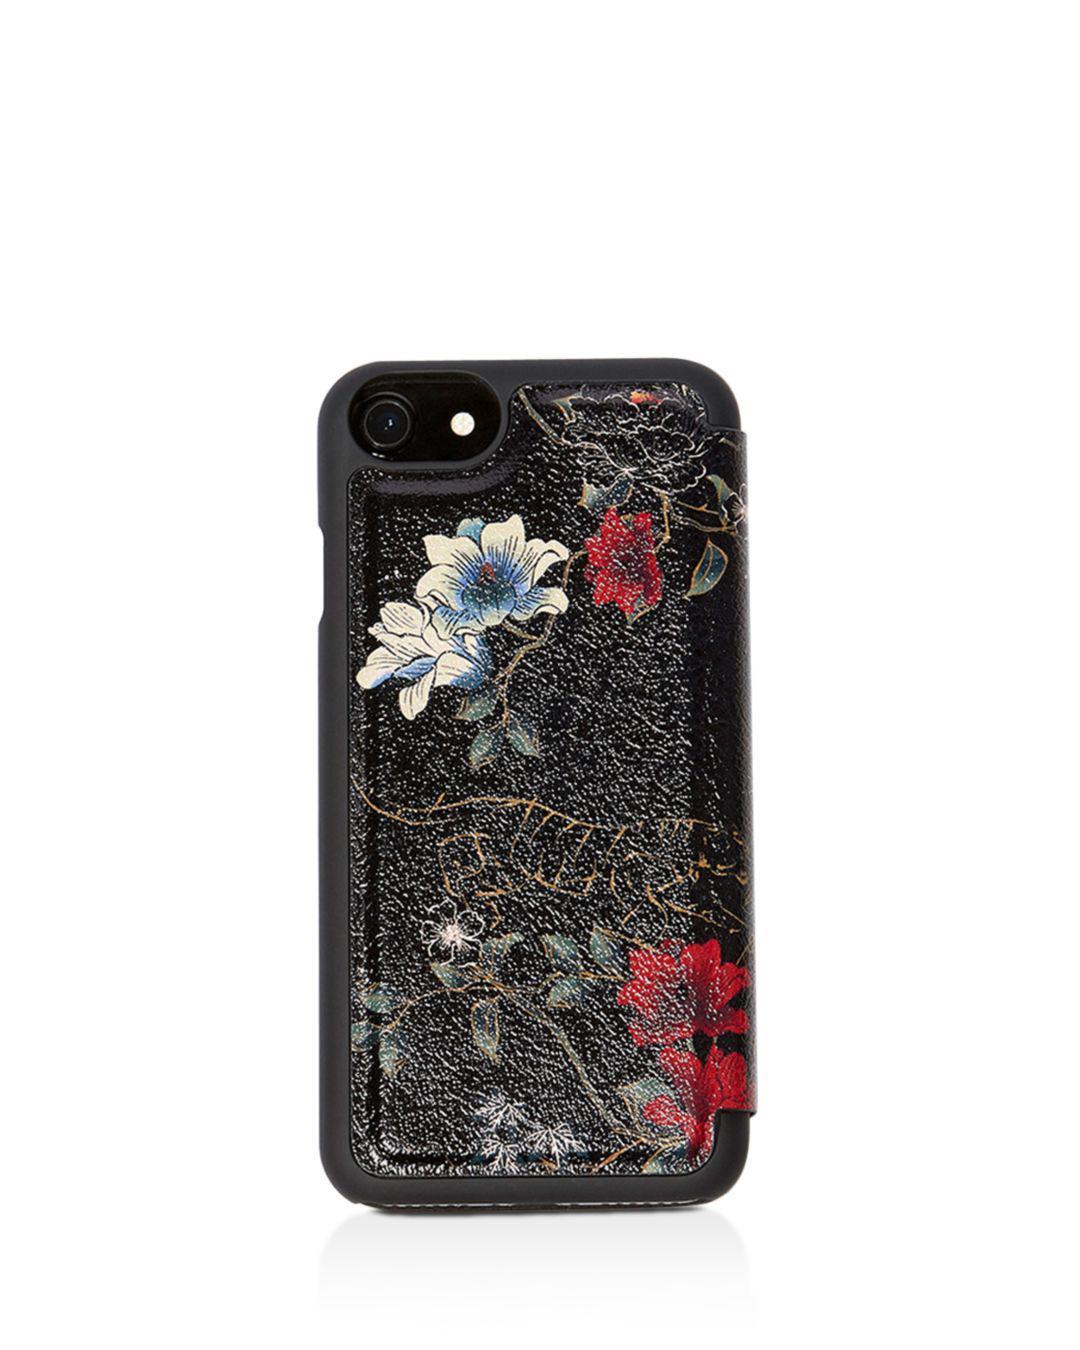 20e52fc70e6d Lyst - Karen Millen Tiger Iphone 7 Case in Black